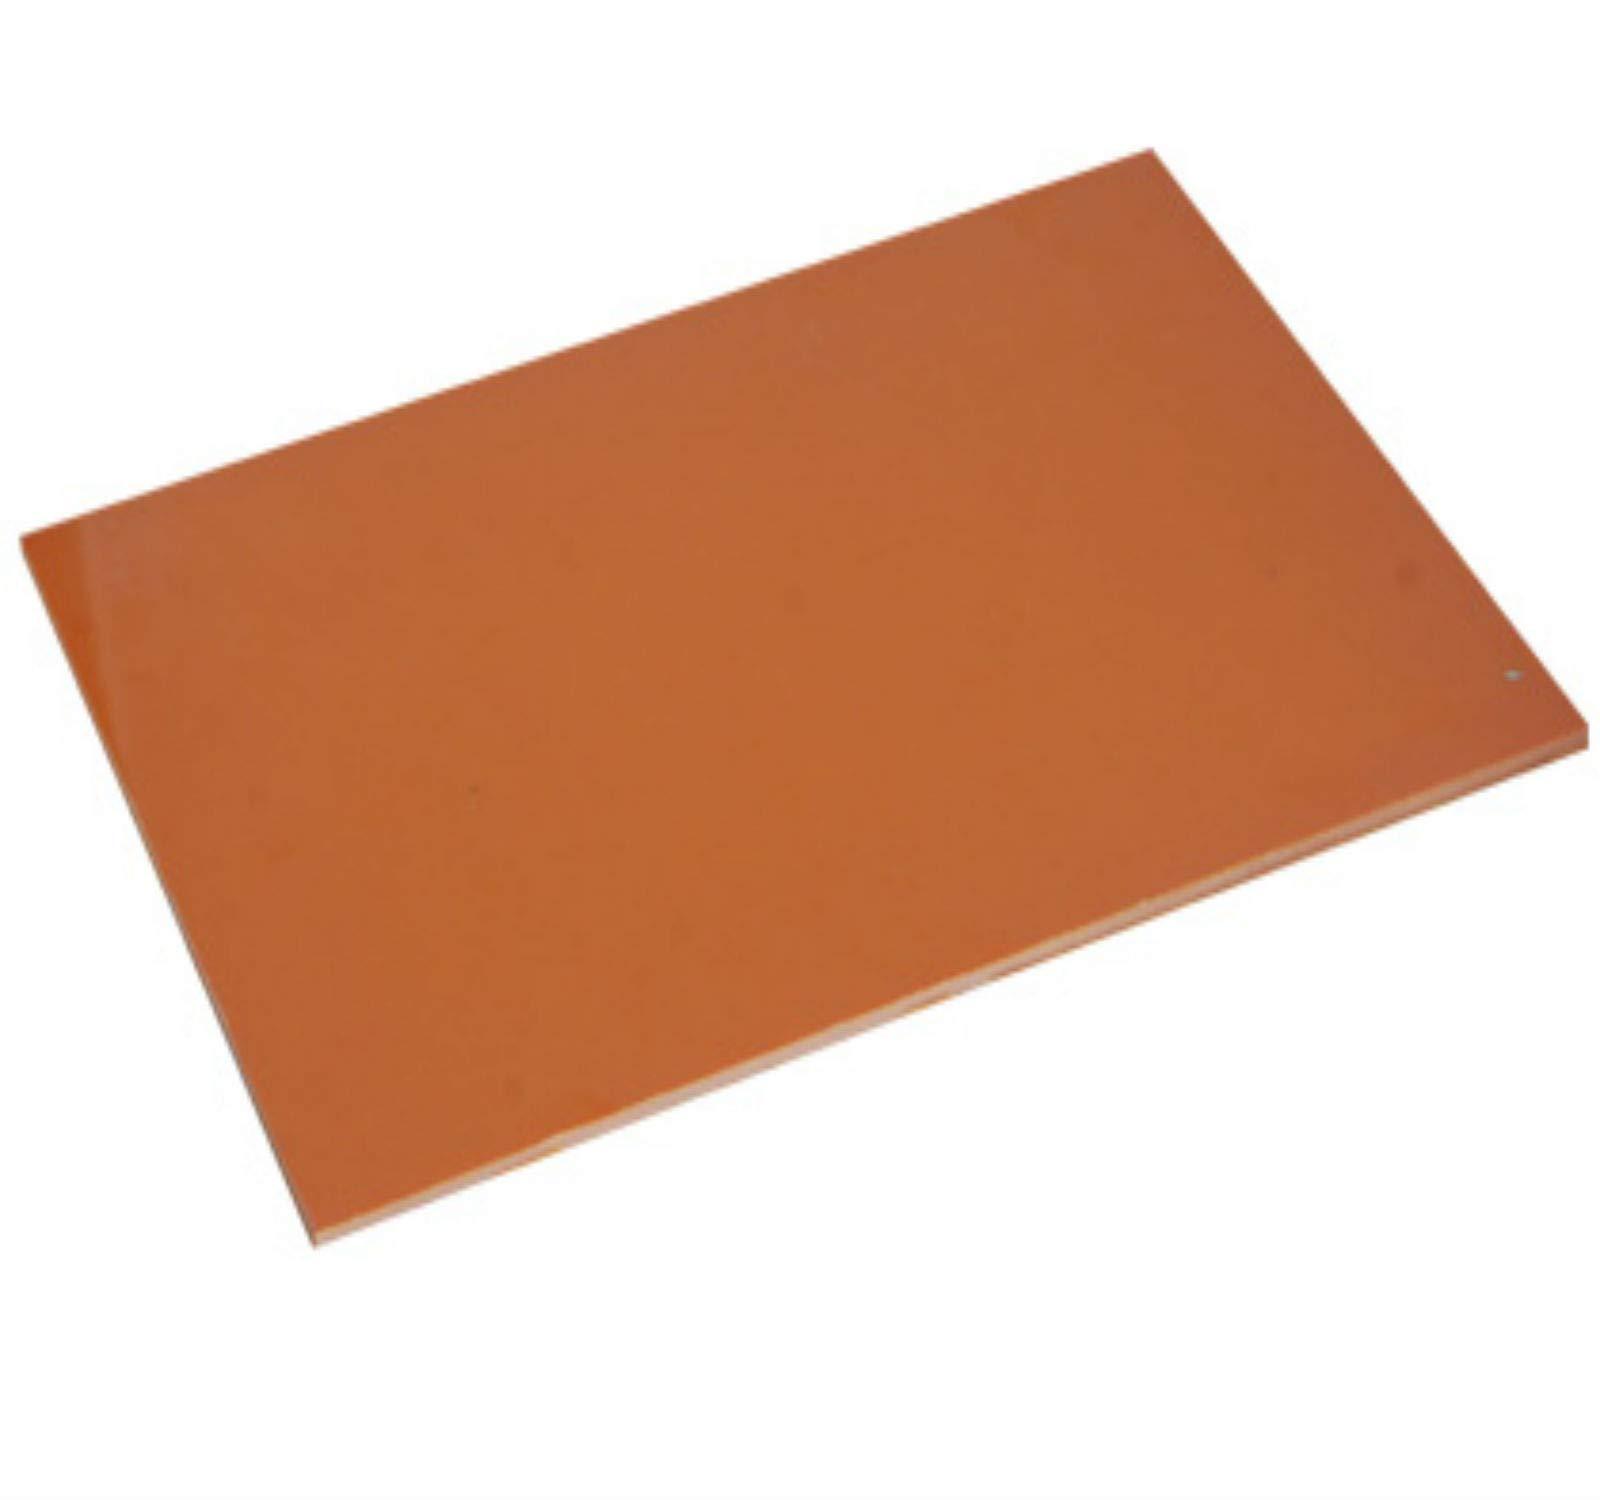 1pcs Bakelite Phenolic Flat Plate Sheet 5mm x 300mm x 300mm by Bakelite